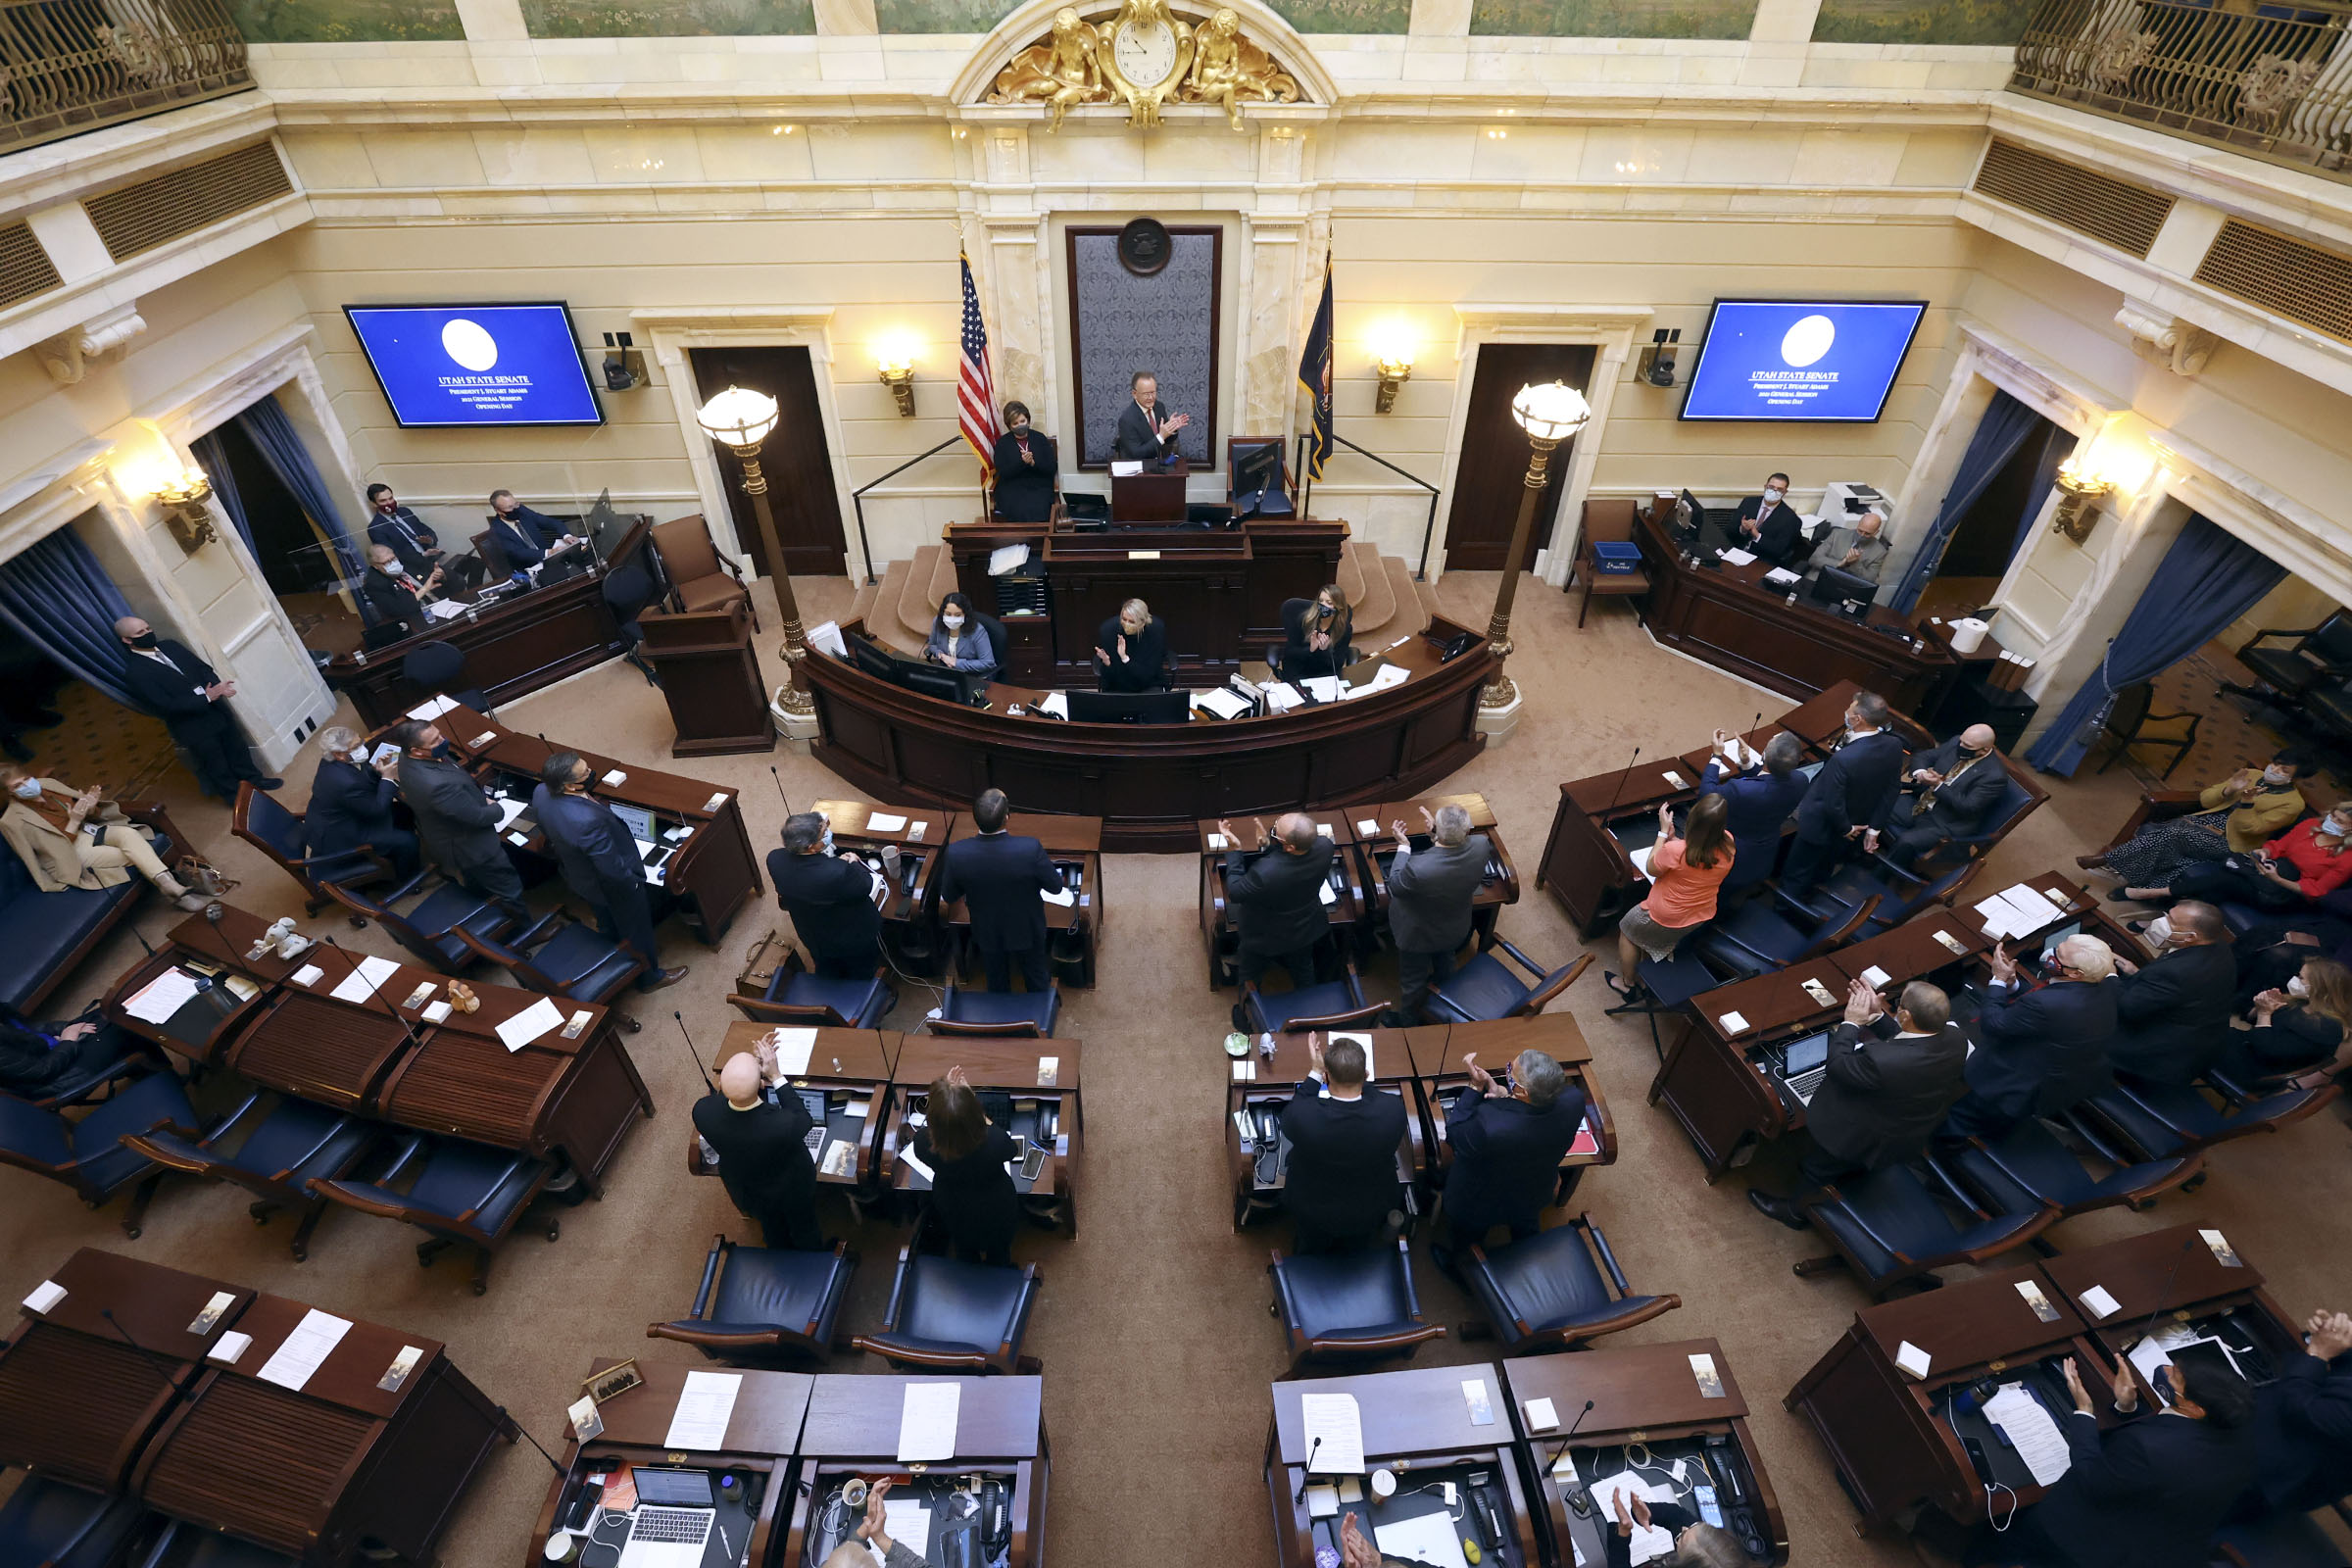 Senate President Stuart Adams, R-Layton, opens the Utah Legislature's2021 general session in the Senate chamber at the Capitol in Salt Lake City on Tuesday, Jan. 19, 2021.